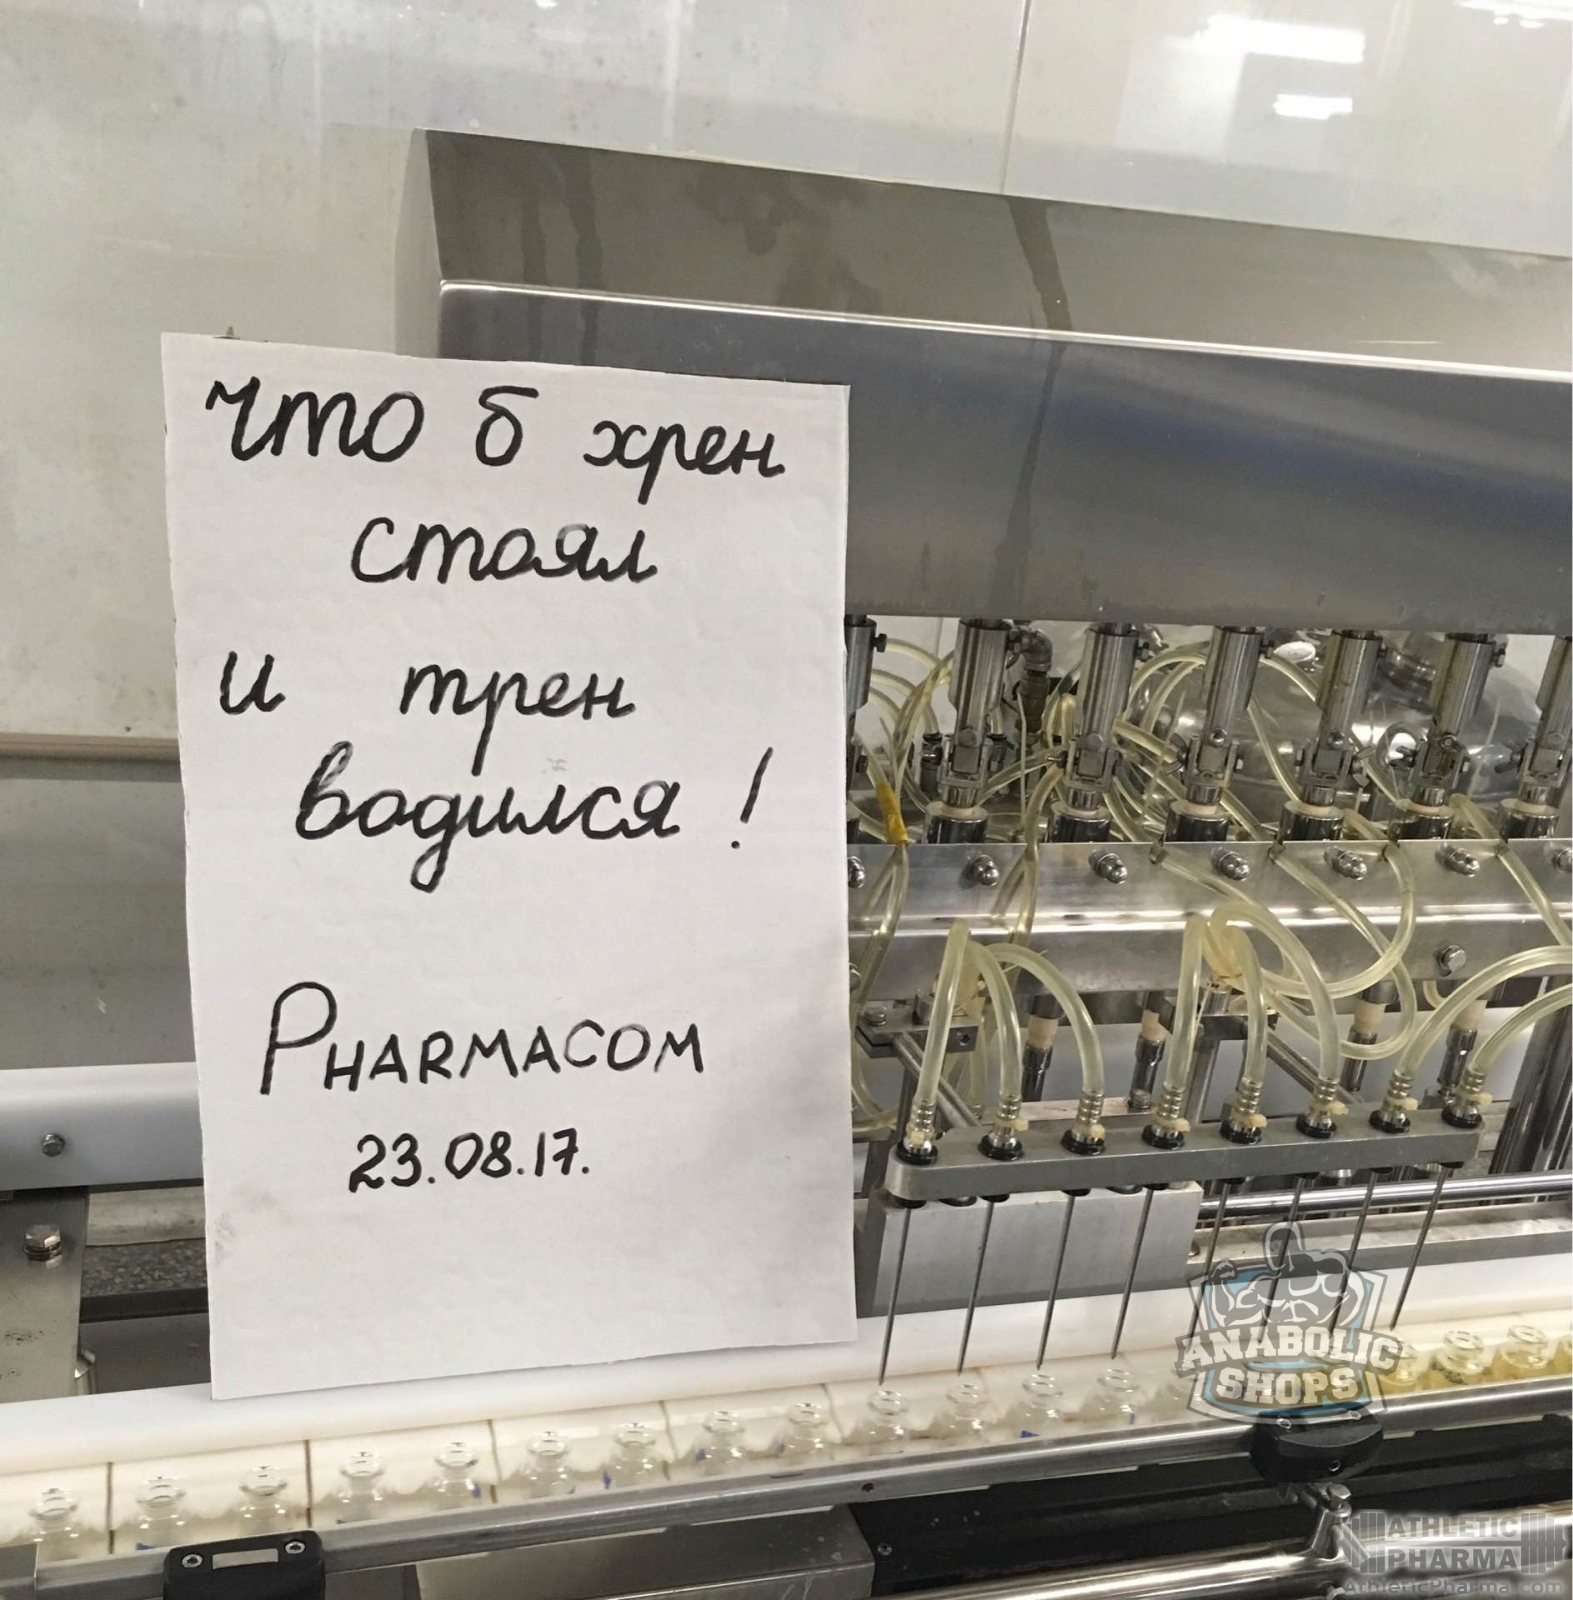 pharmacom labs 5